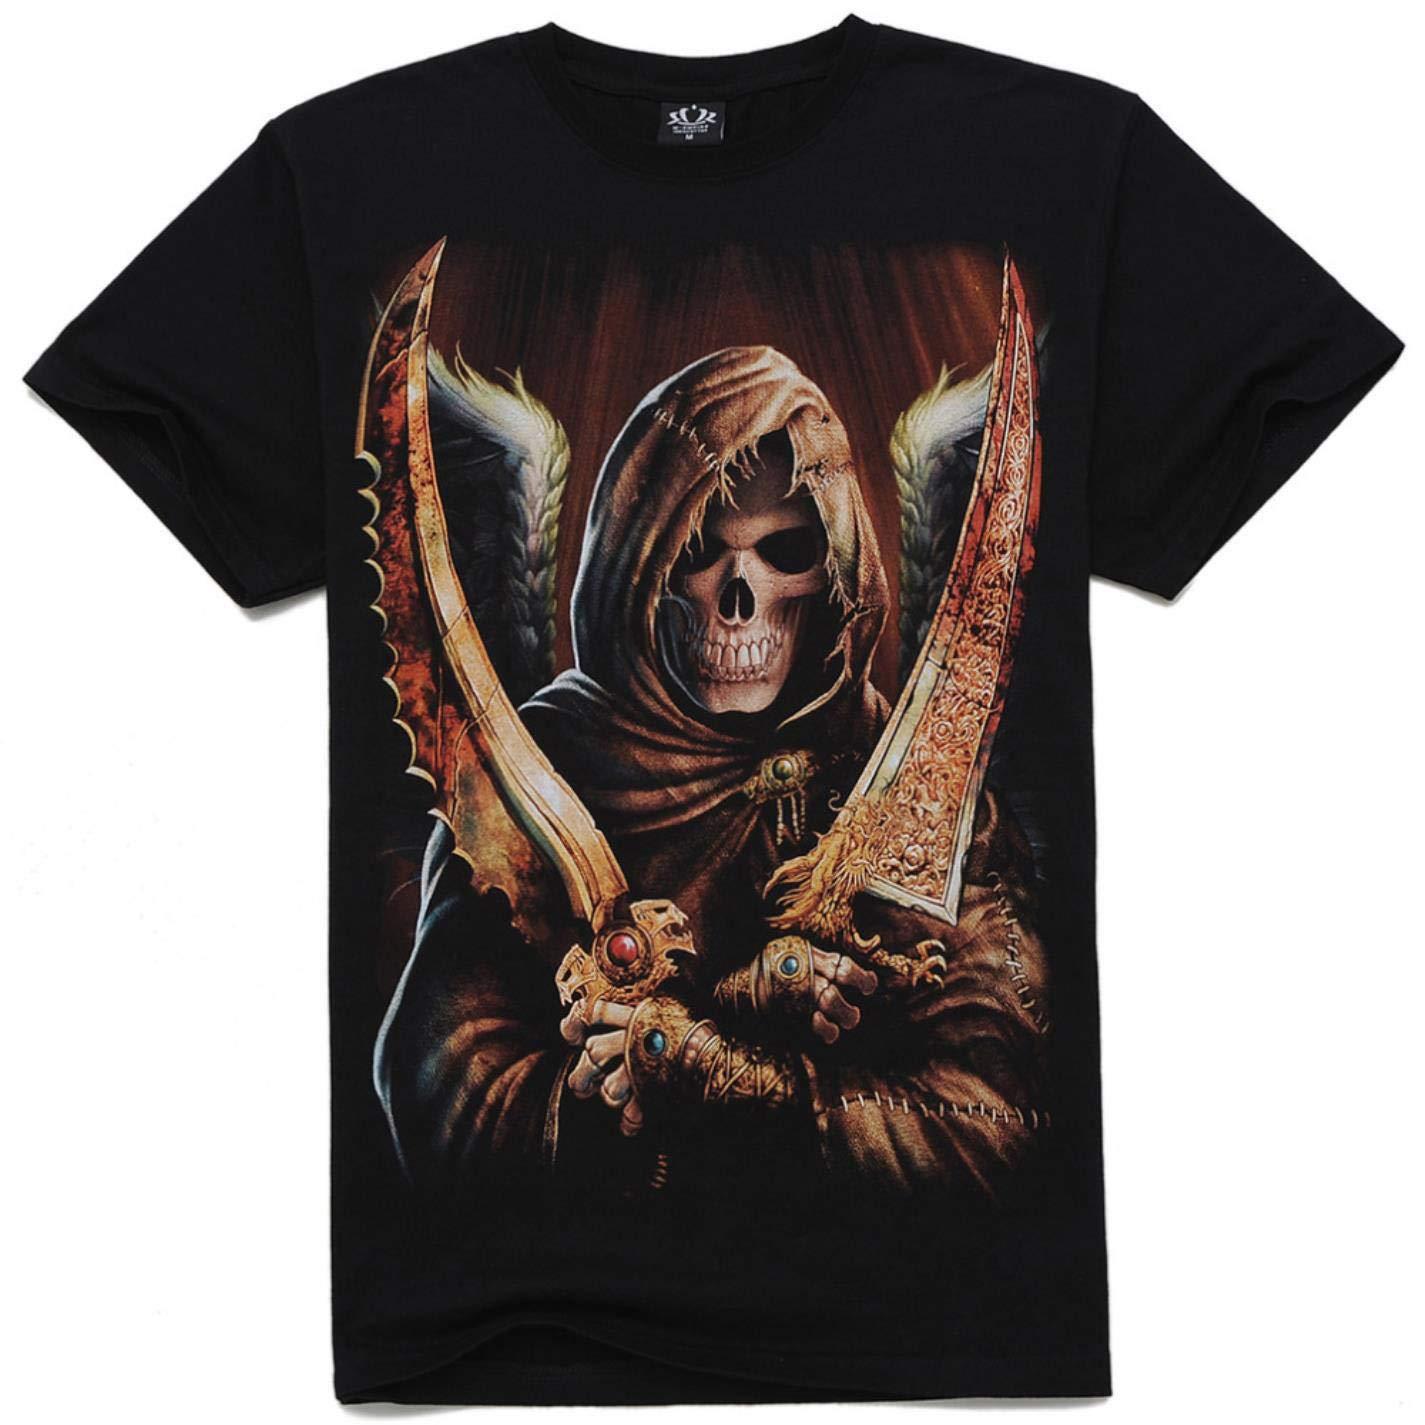 NNQT Mens 3D Death Skull Printed T-Shirt Dark Style Clothing Cotton